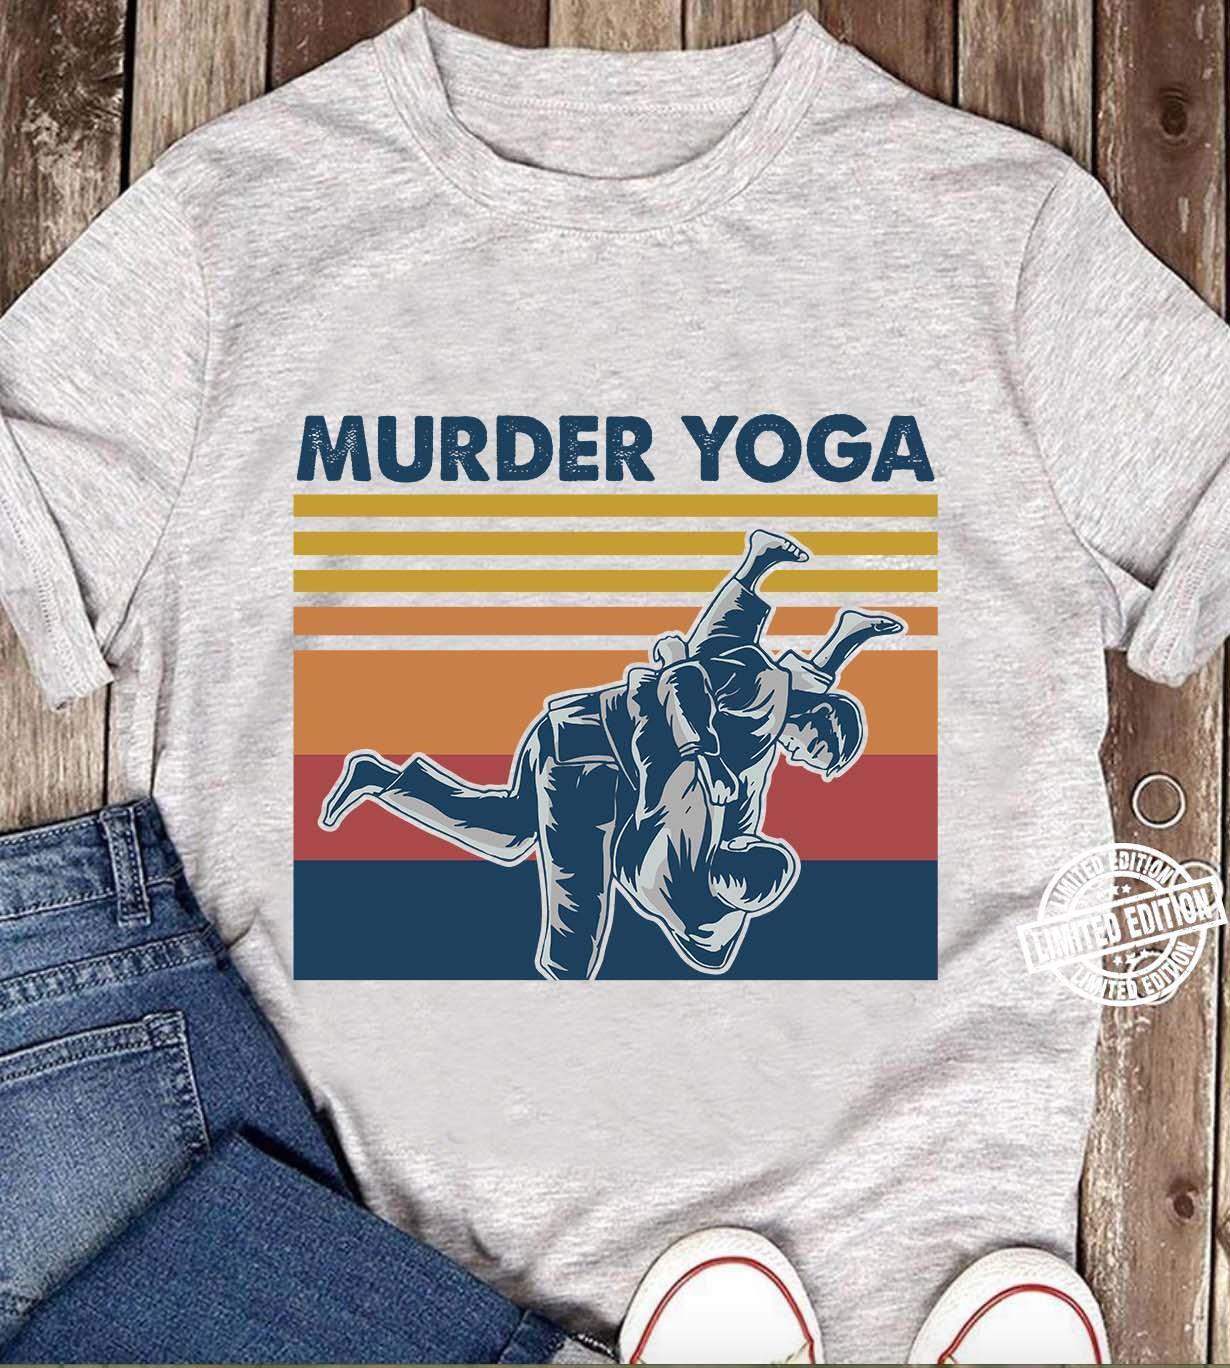 JIU JITSU Murder Yoga Shirt